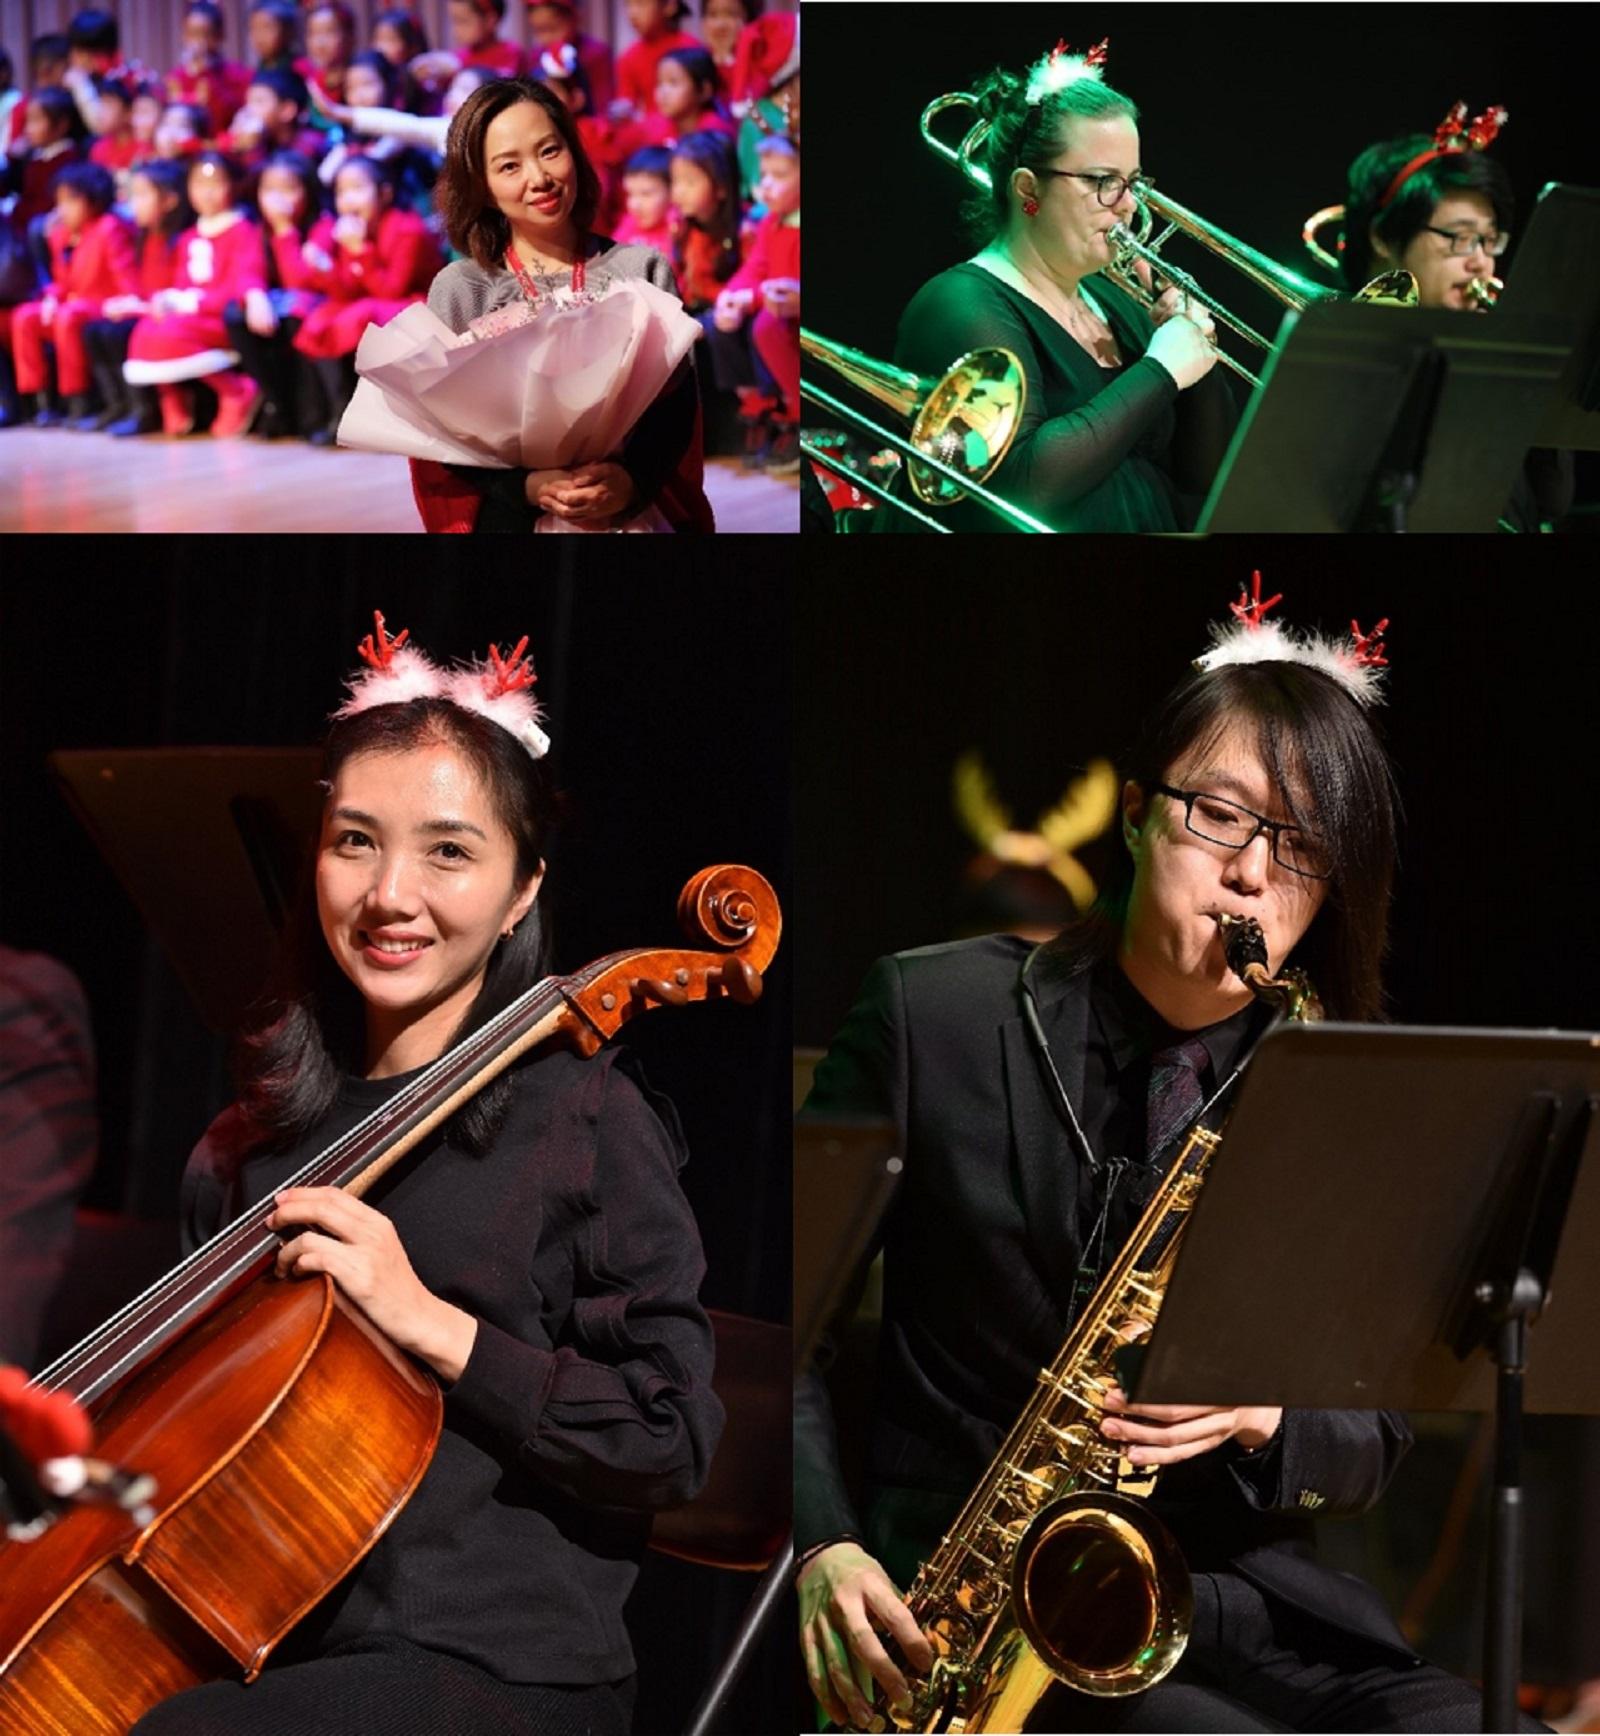 4 teachers of music team